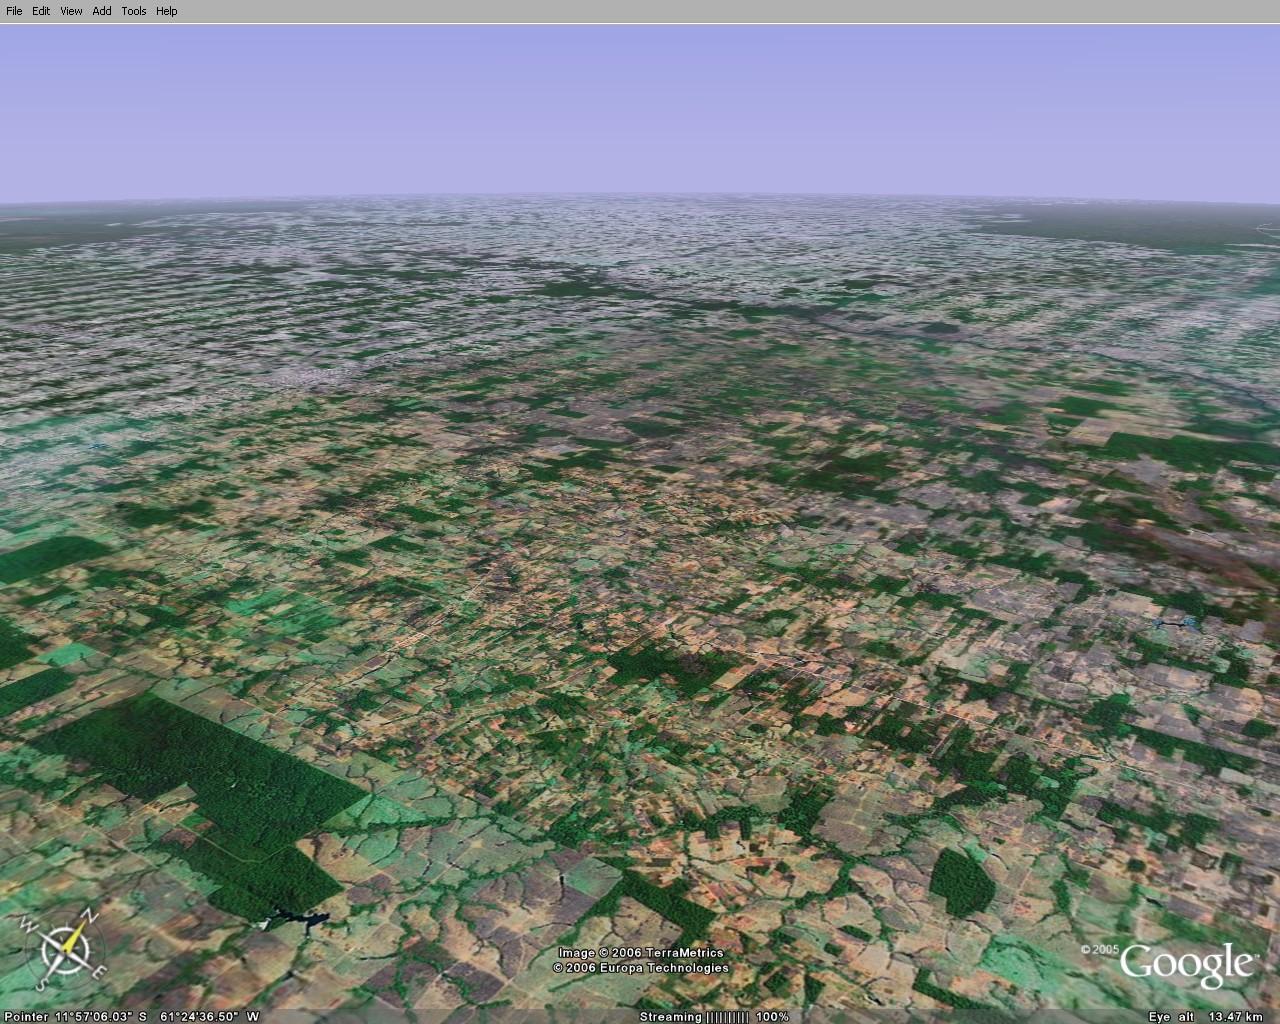 folgen abholzung tropischer regenwald